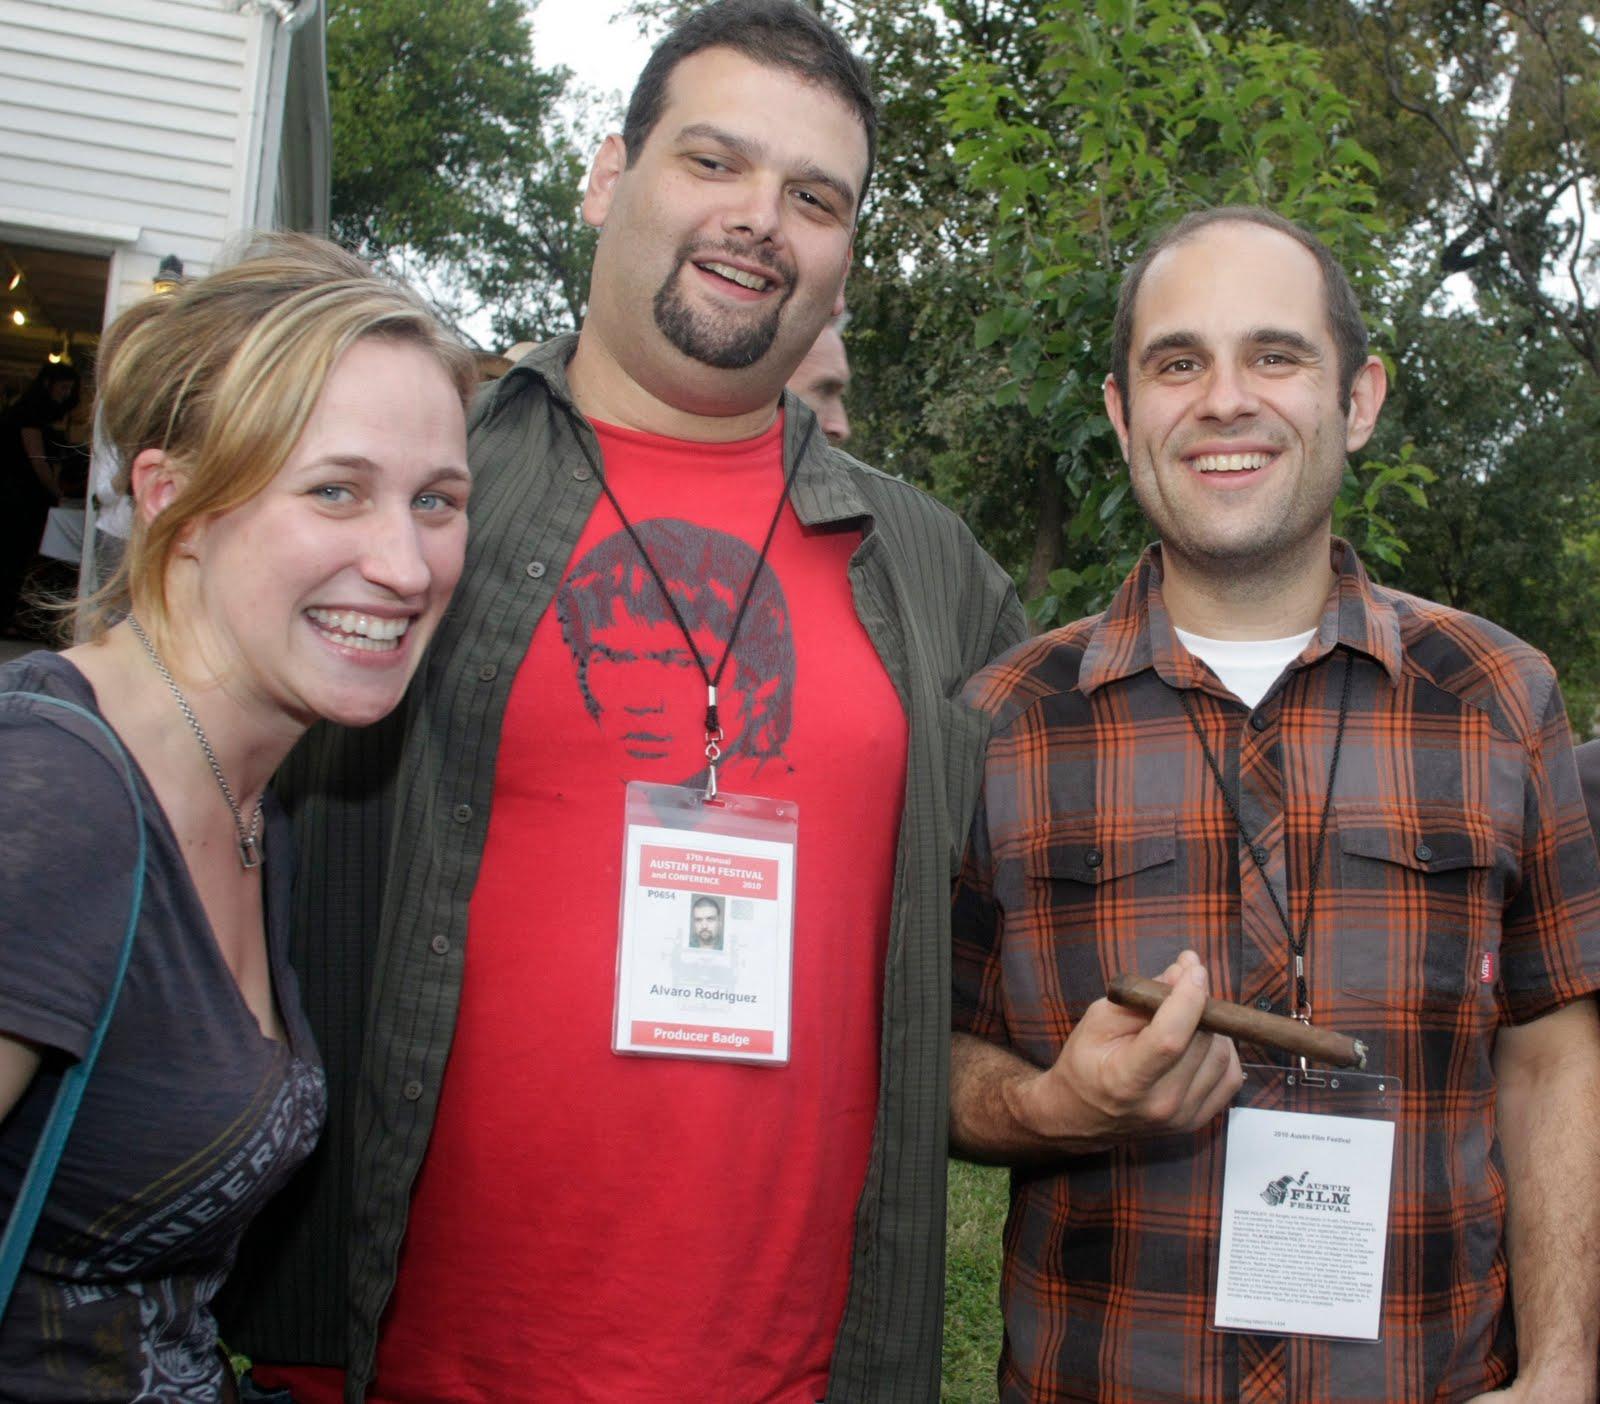 Pamela Ribon, Álvaro Rodríguez and Craig Mazin at the 2010 Film Texas BBQ. Photo credit Jack Plunkett.